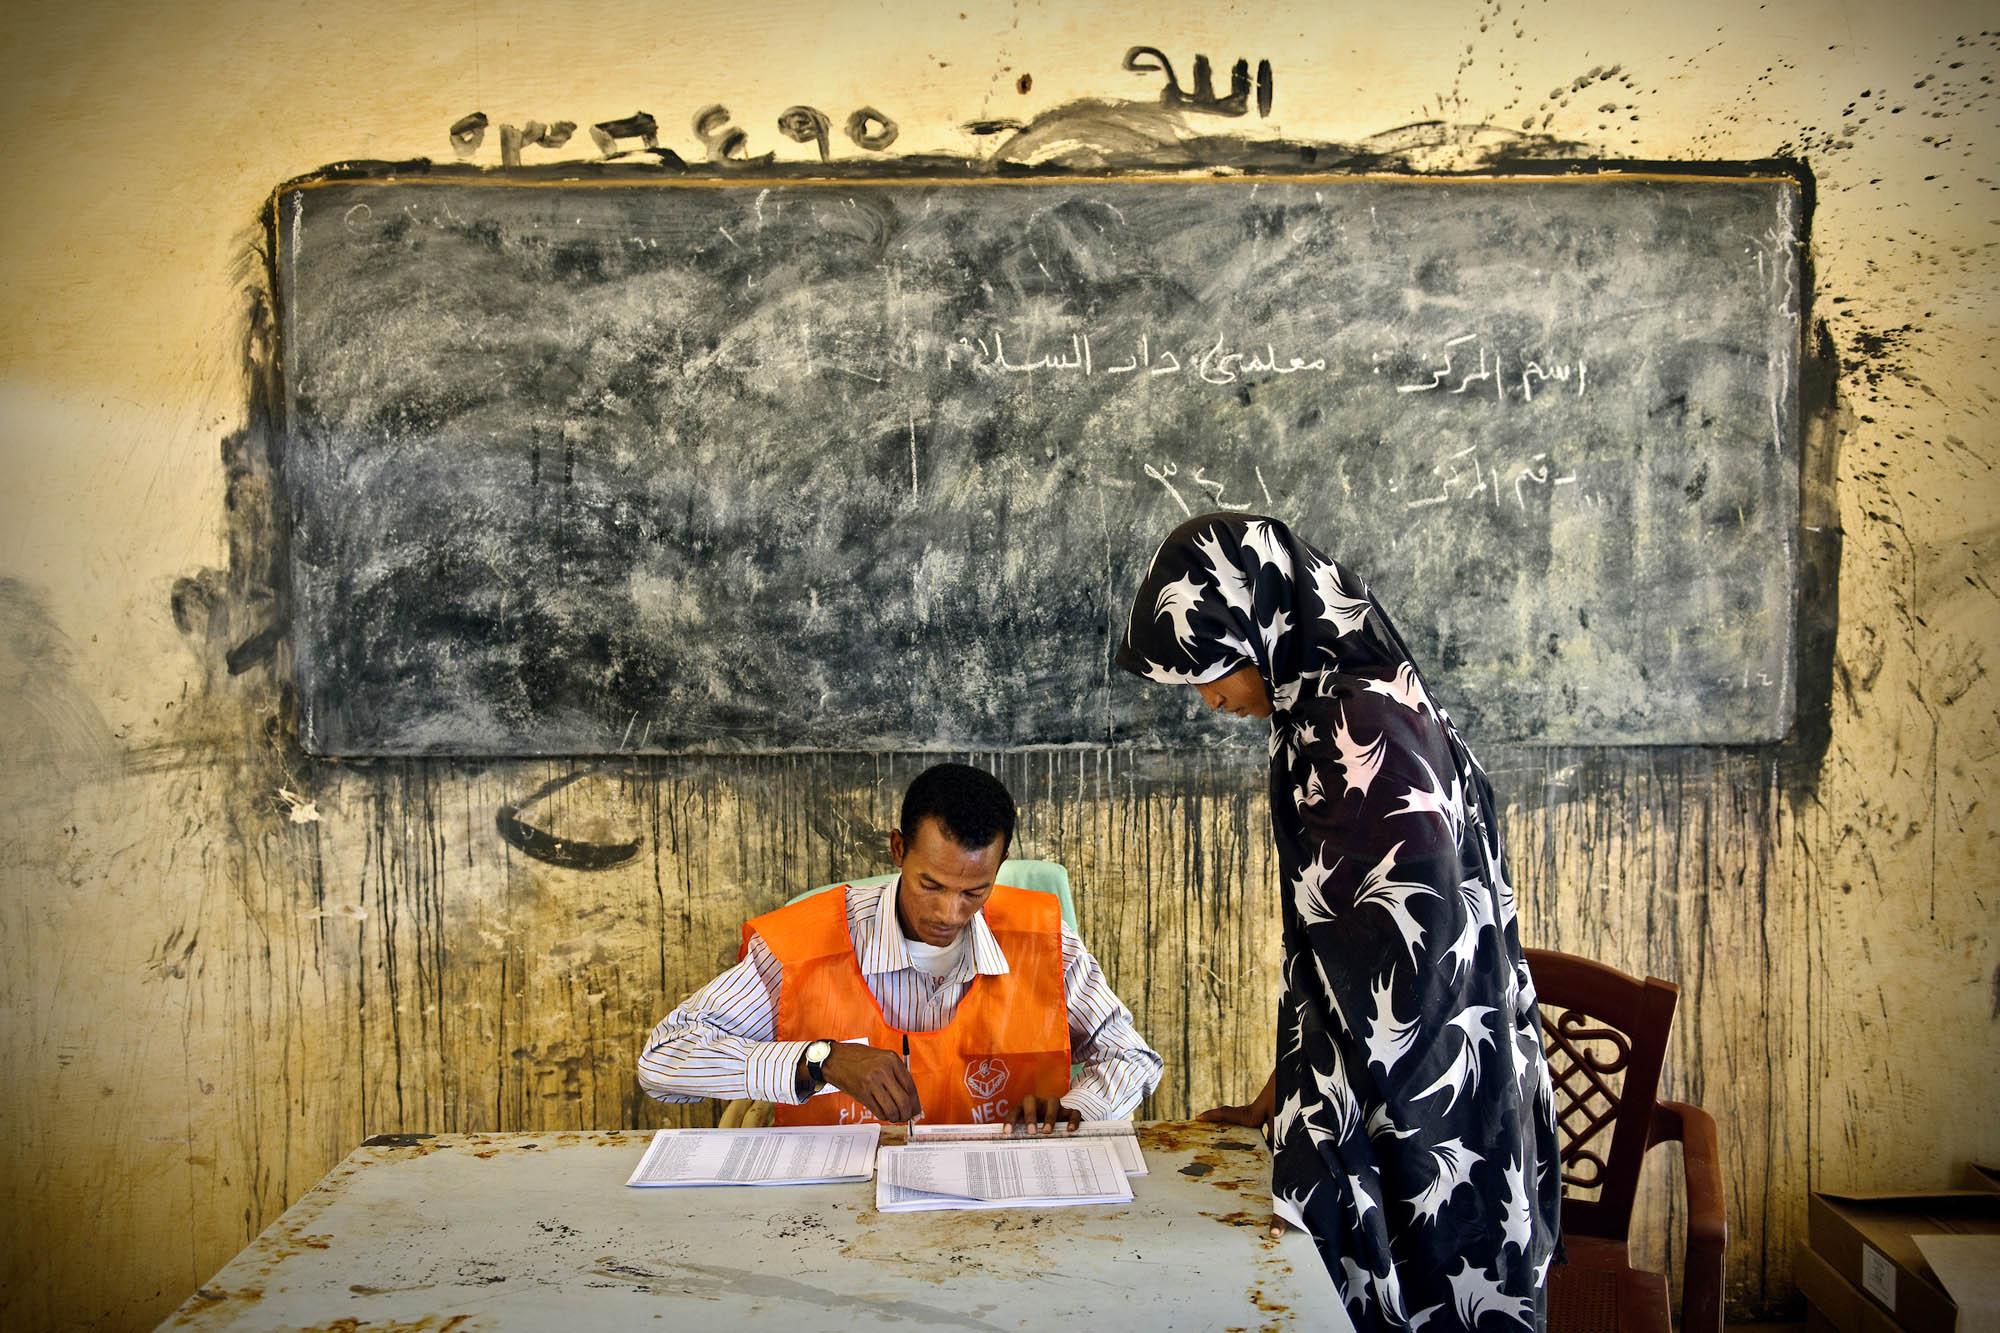 Sudan - Elections